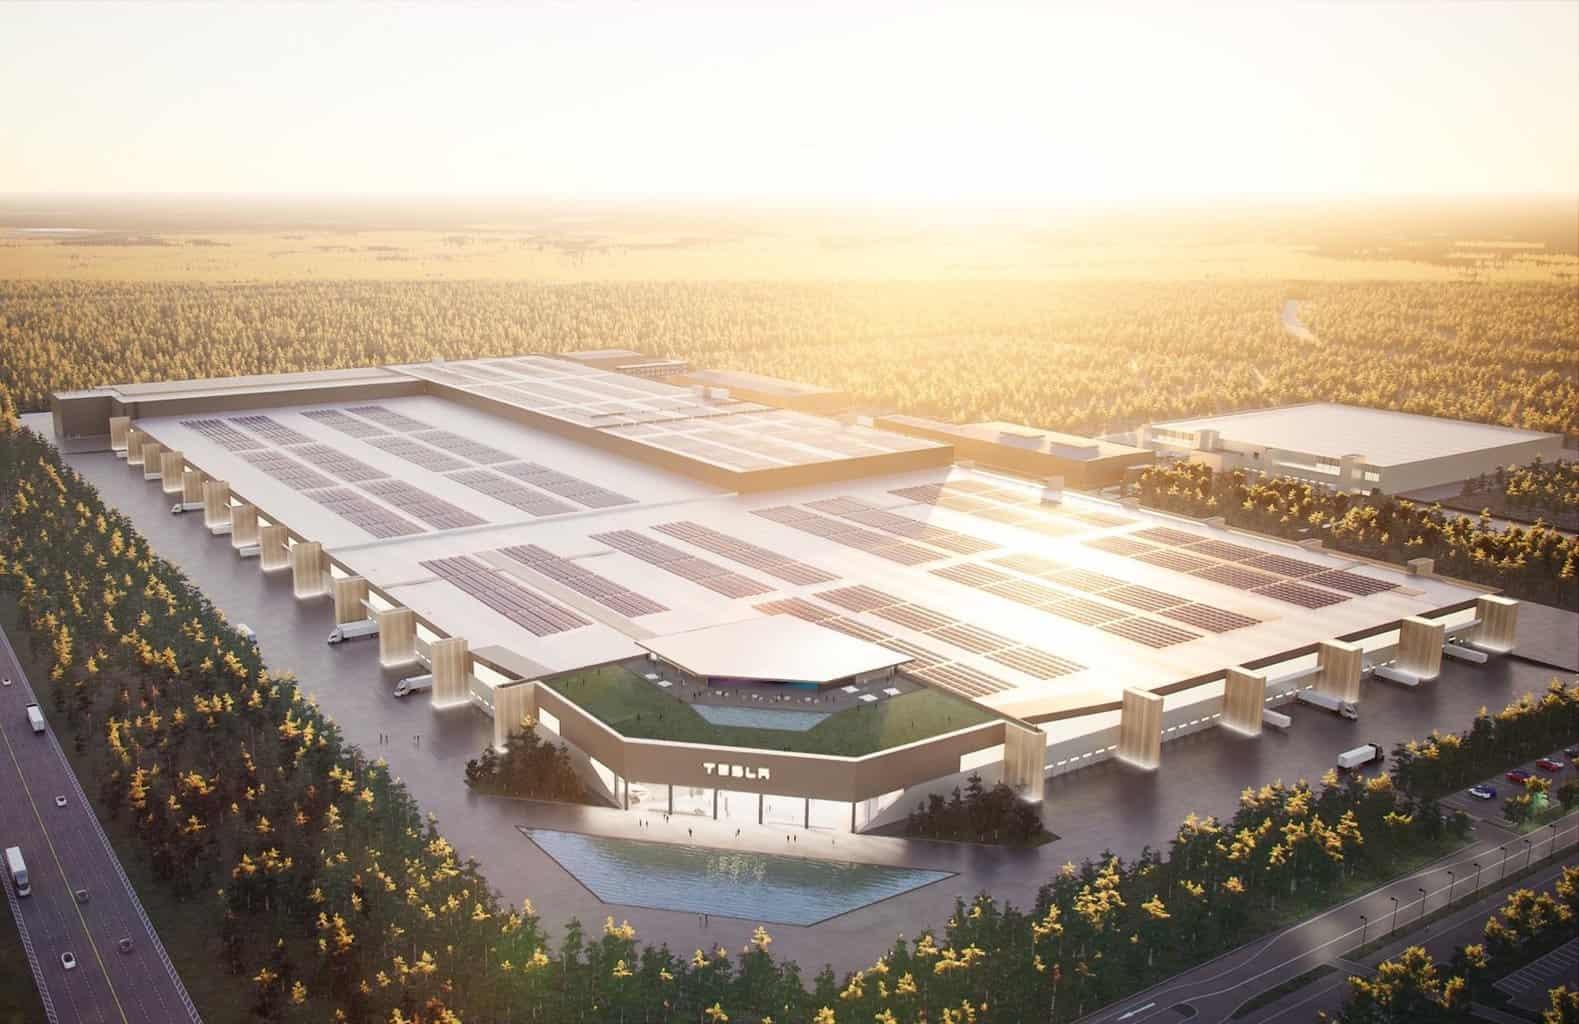 Elektroauto-Fabrik in Grünheide: So soll Teslas Giga Berlin aussehen